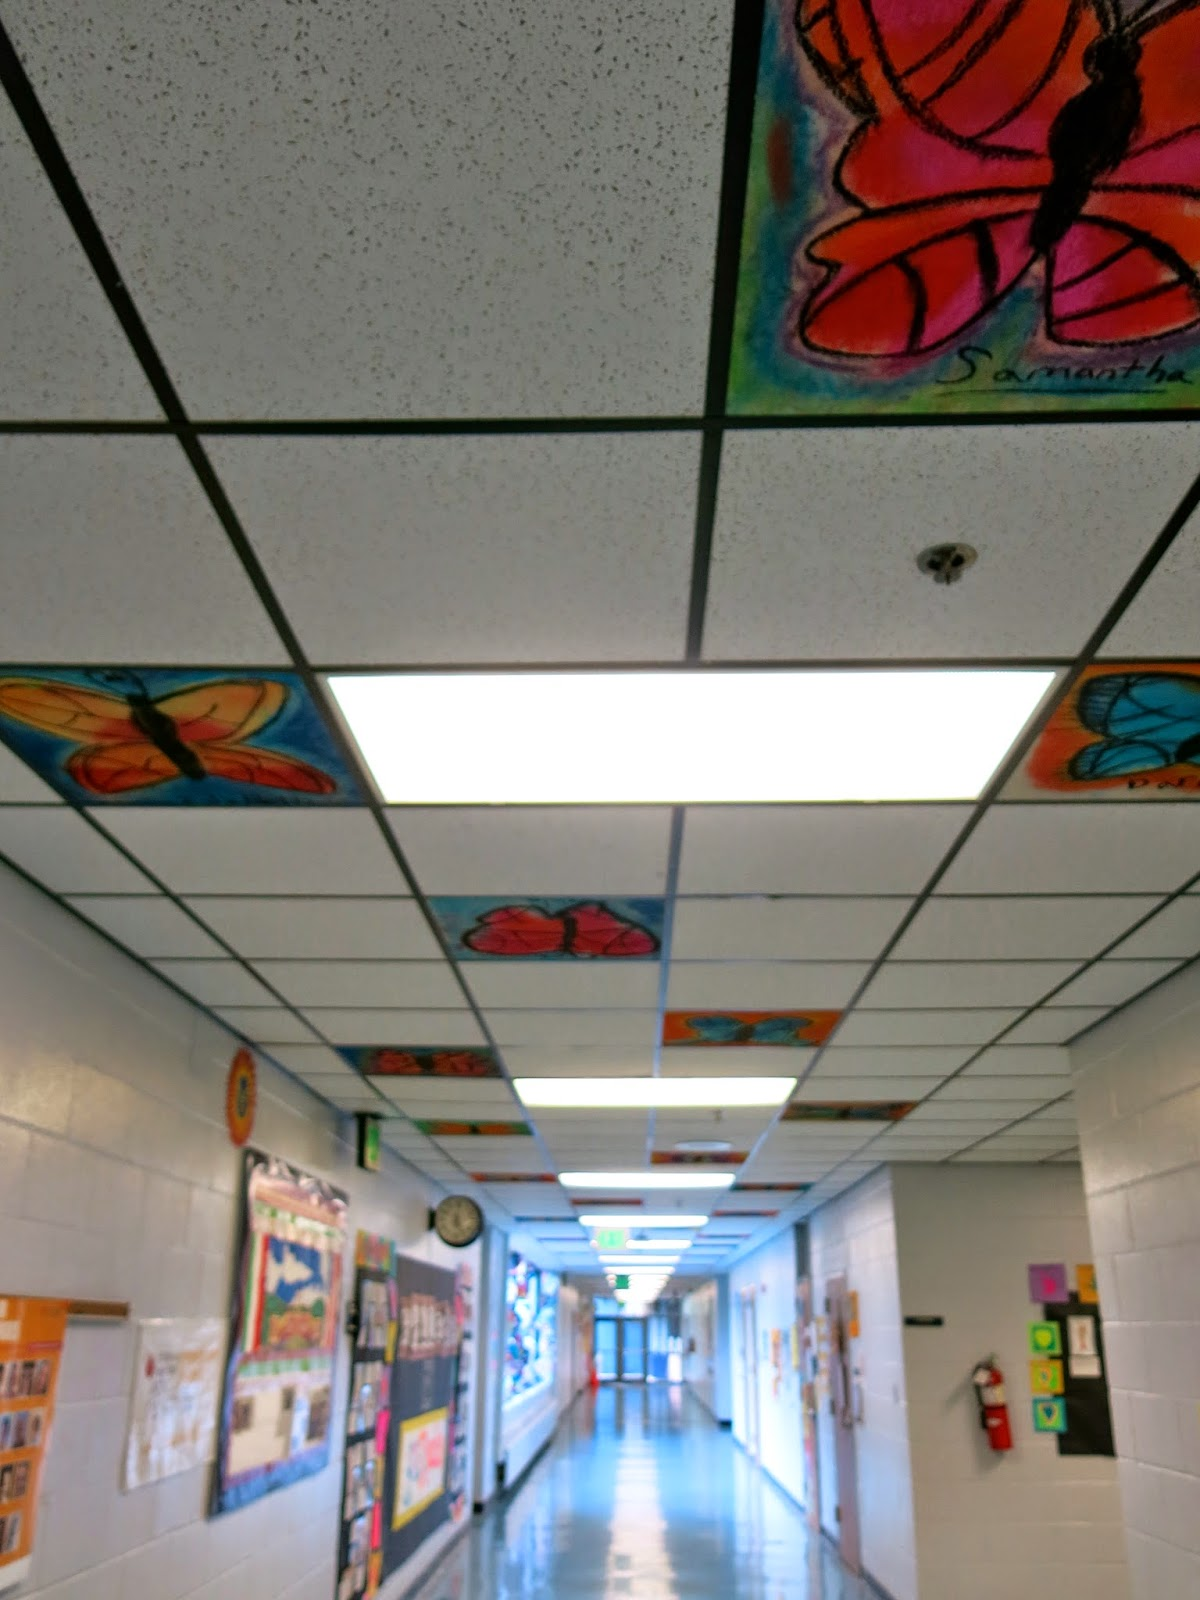 Ceiling tile art ideas